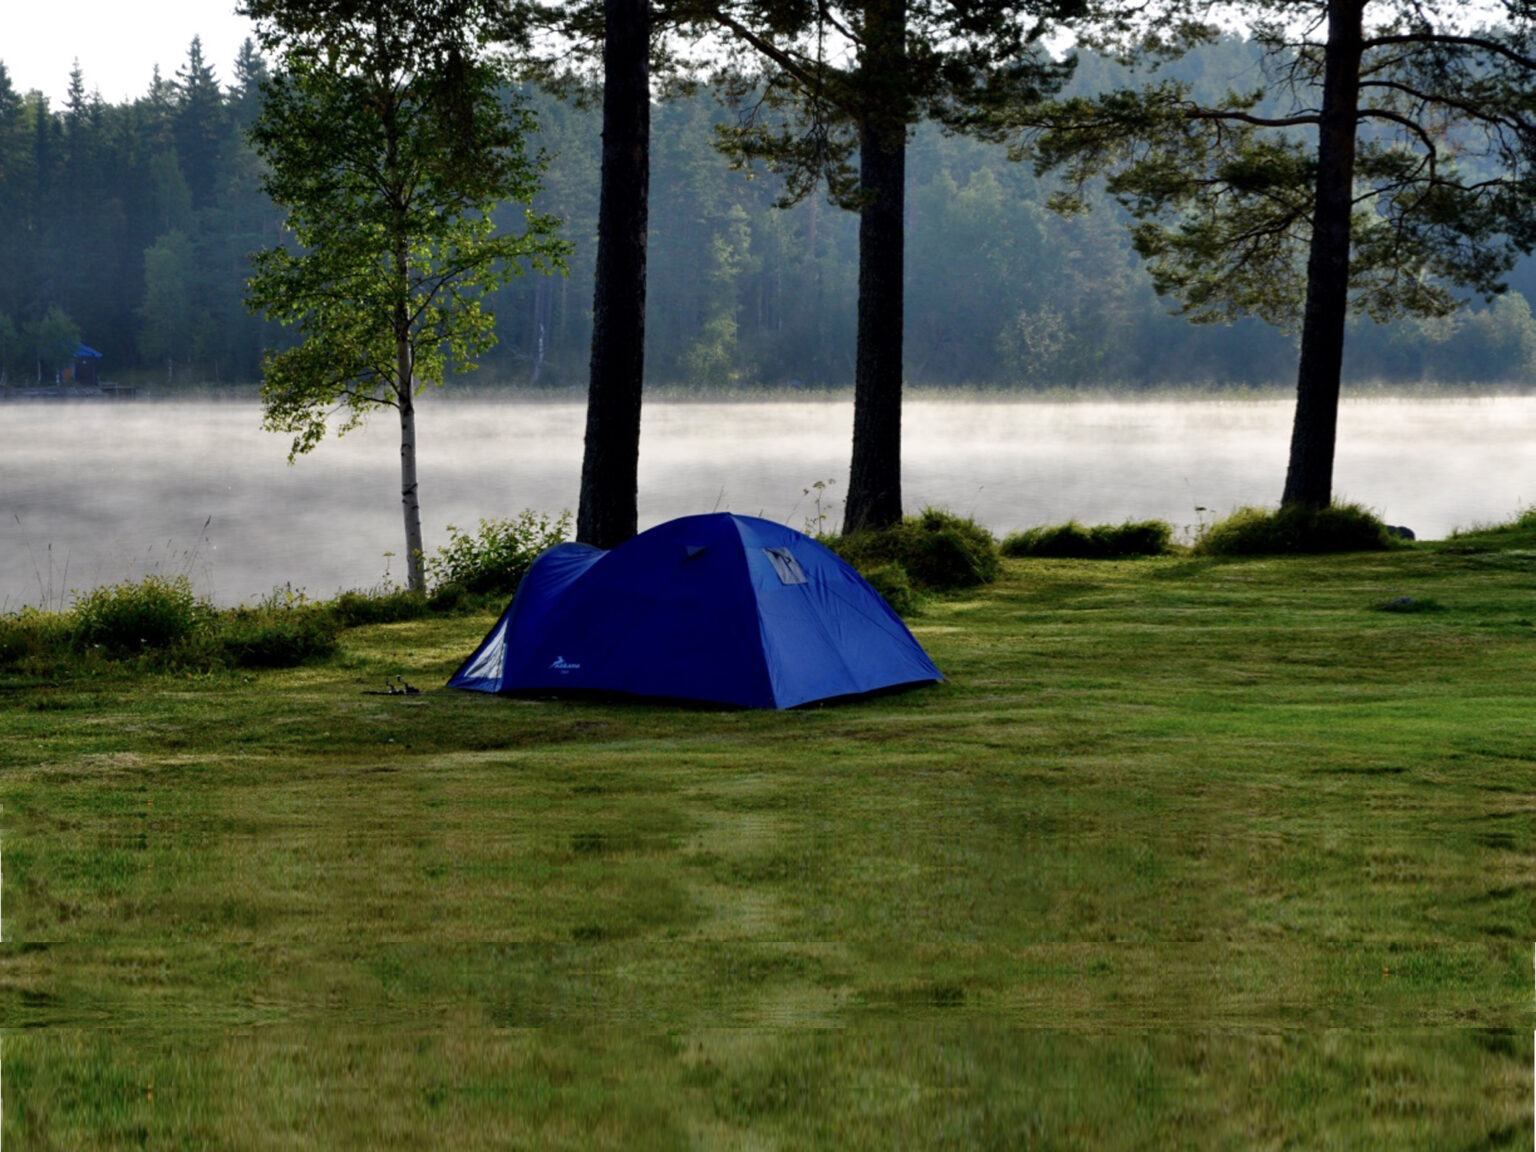 Accommodation Tent